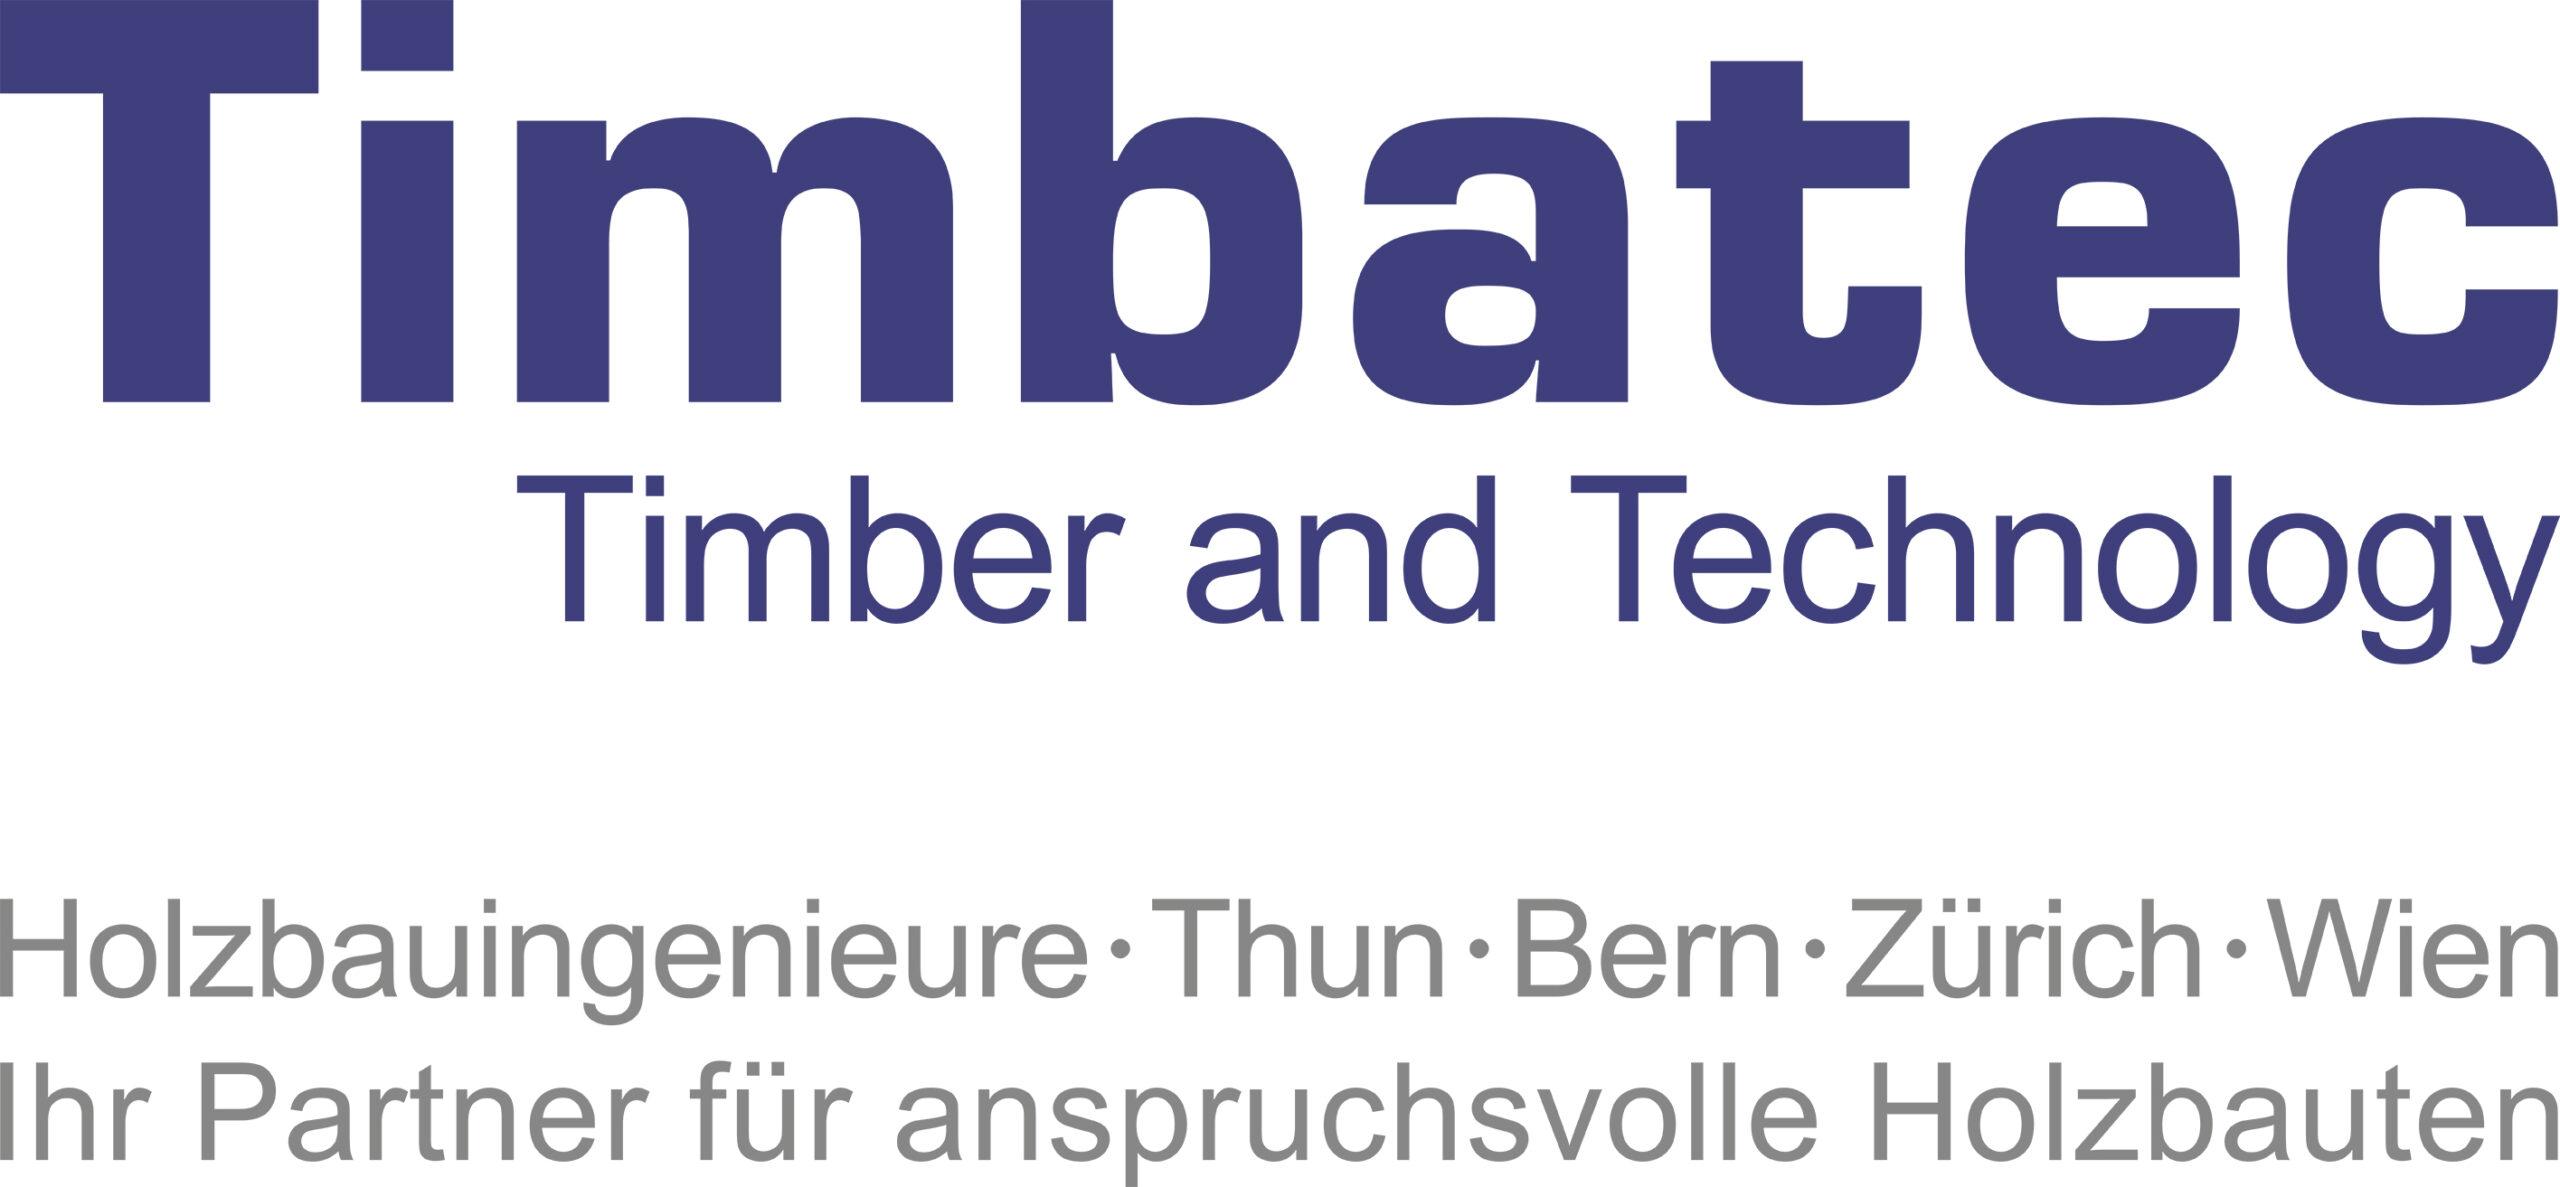 Timbatec_TimberAndTechnology_Zusatz_cmyk_72dpi